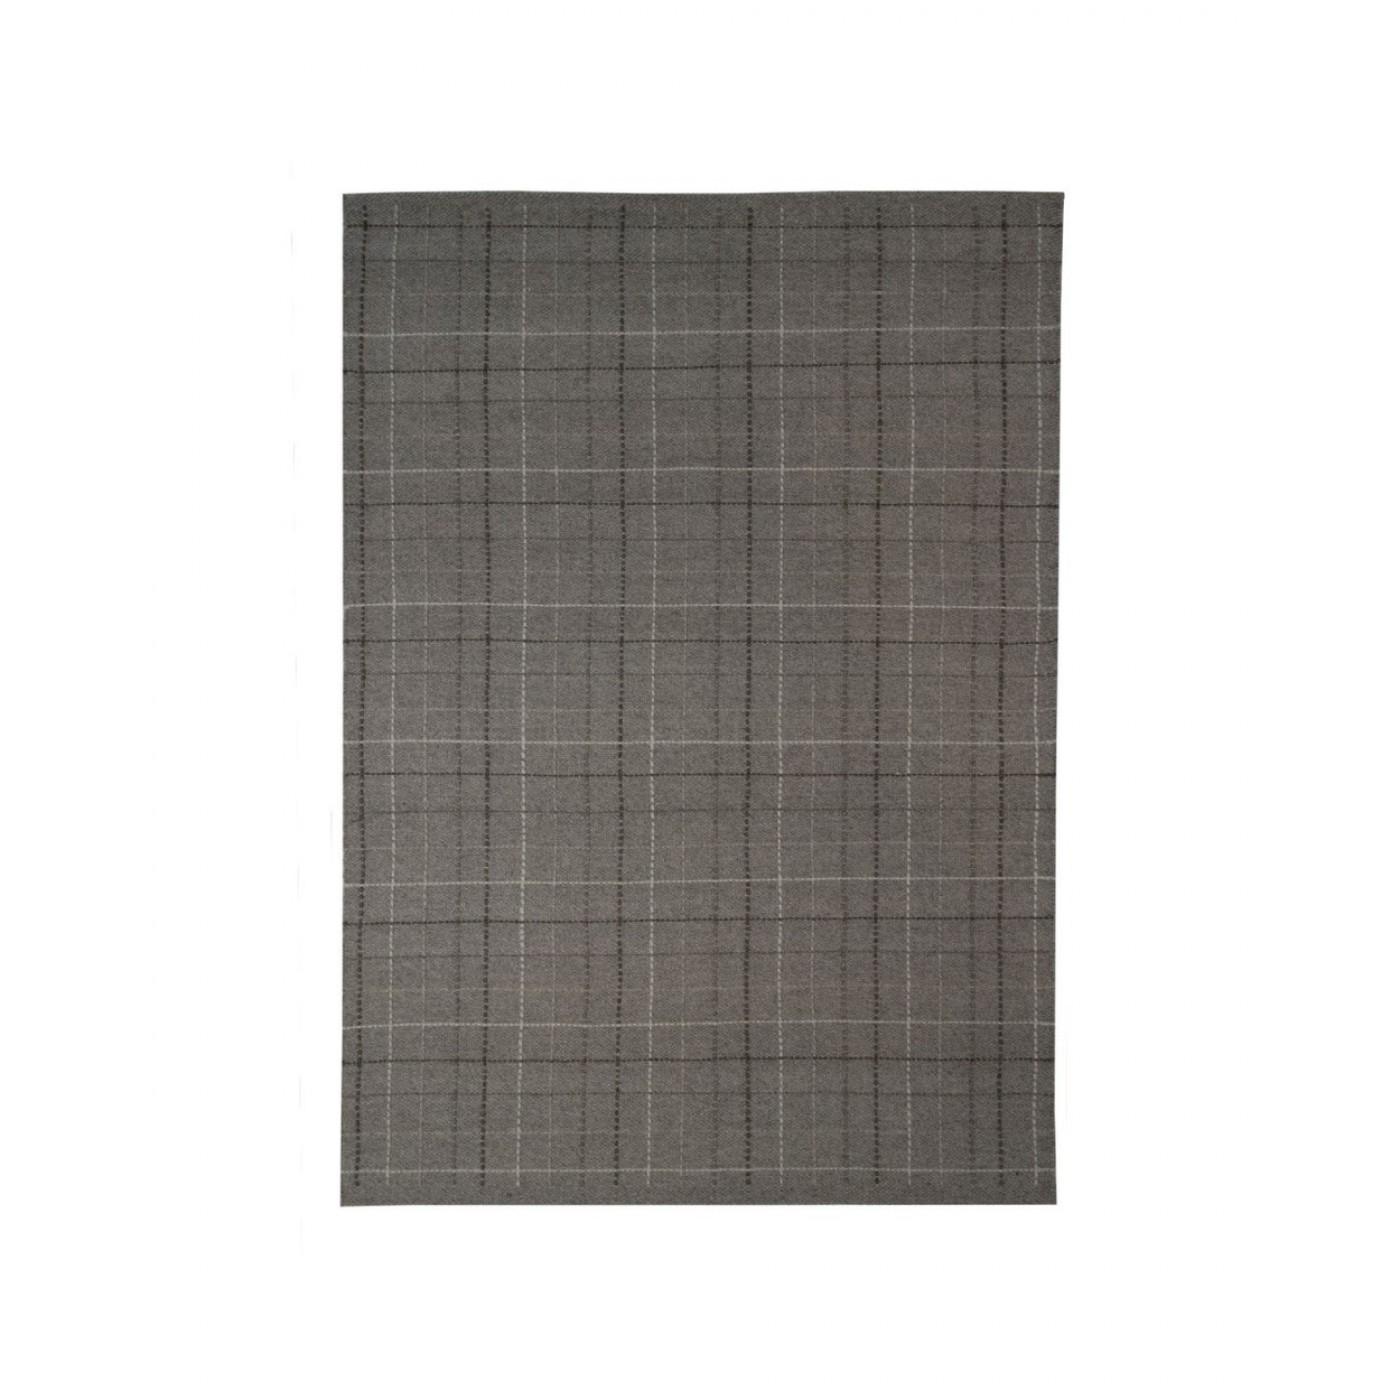 HIGHFIELD VLOERKLEED grey heather